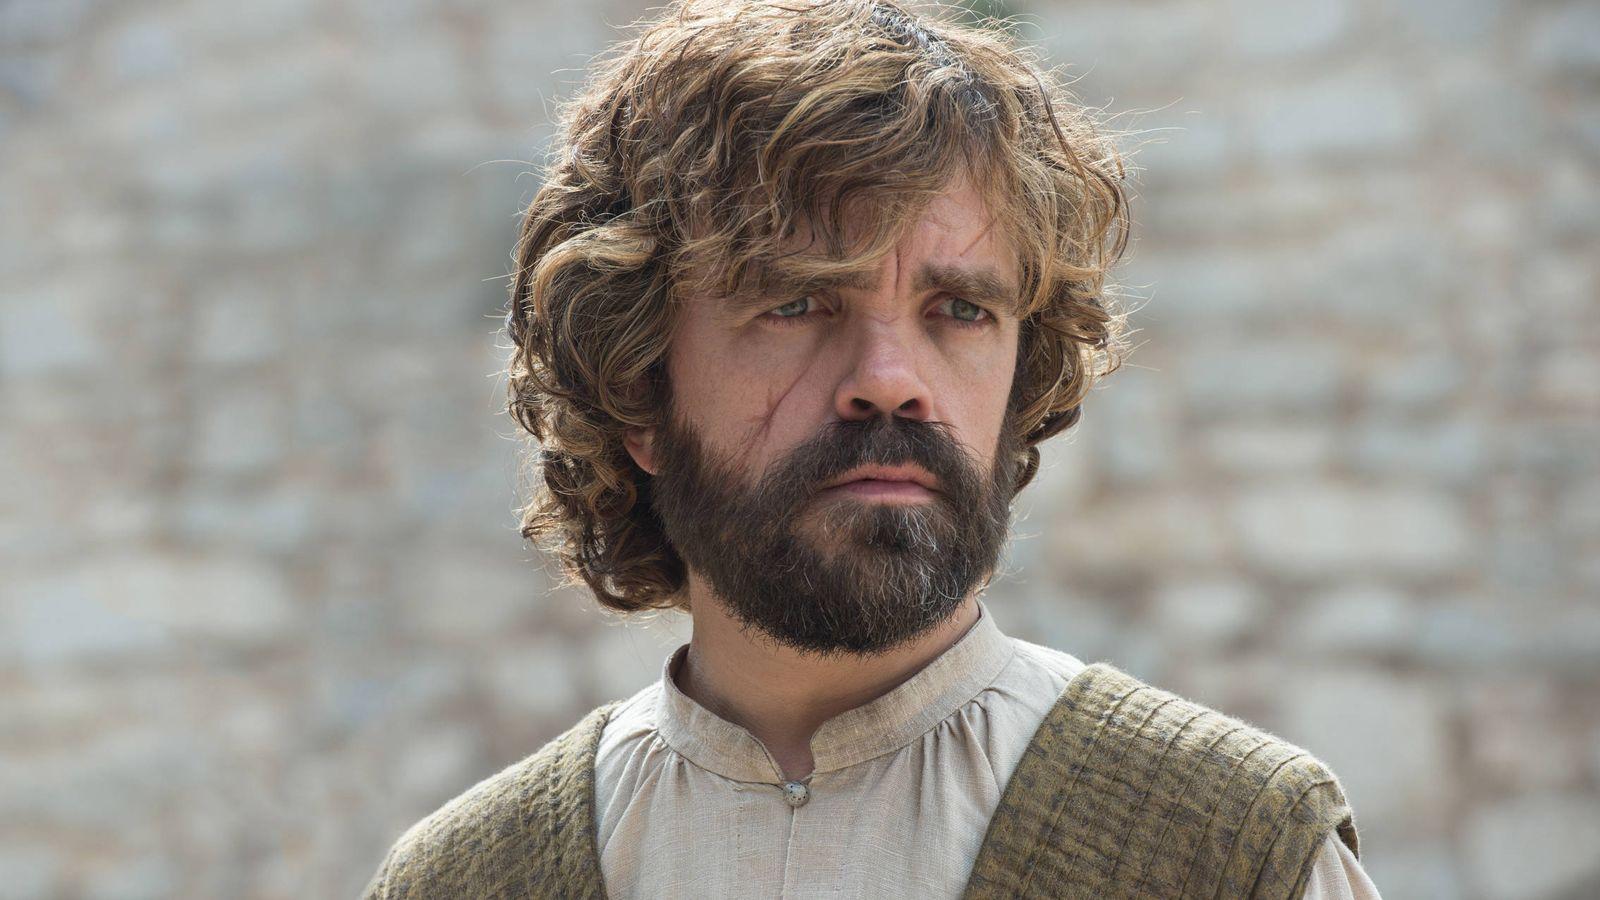 Foto: Peter Dinklage (Tyrion Lannister) en 'Juego de tronos'.